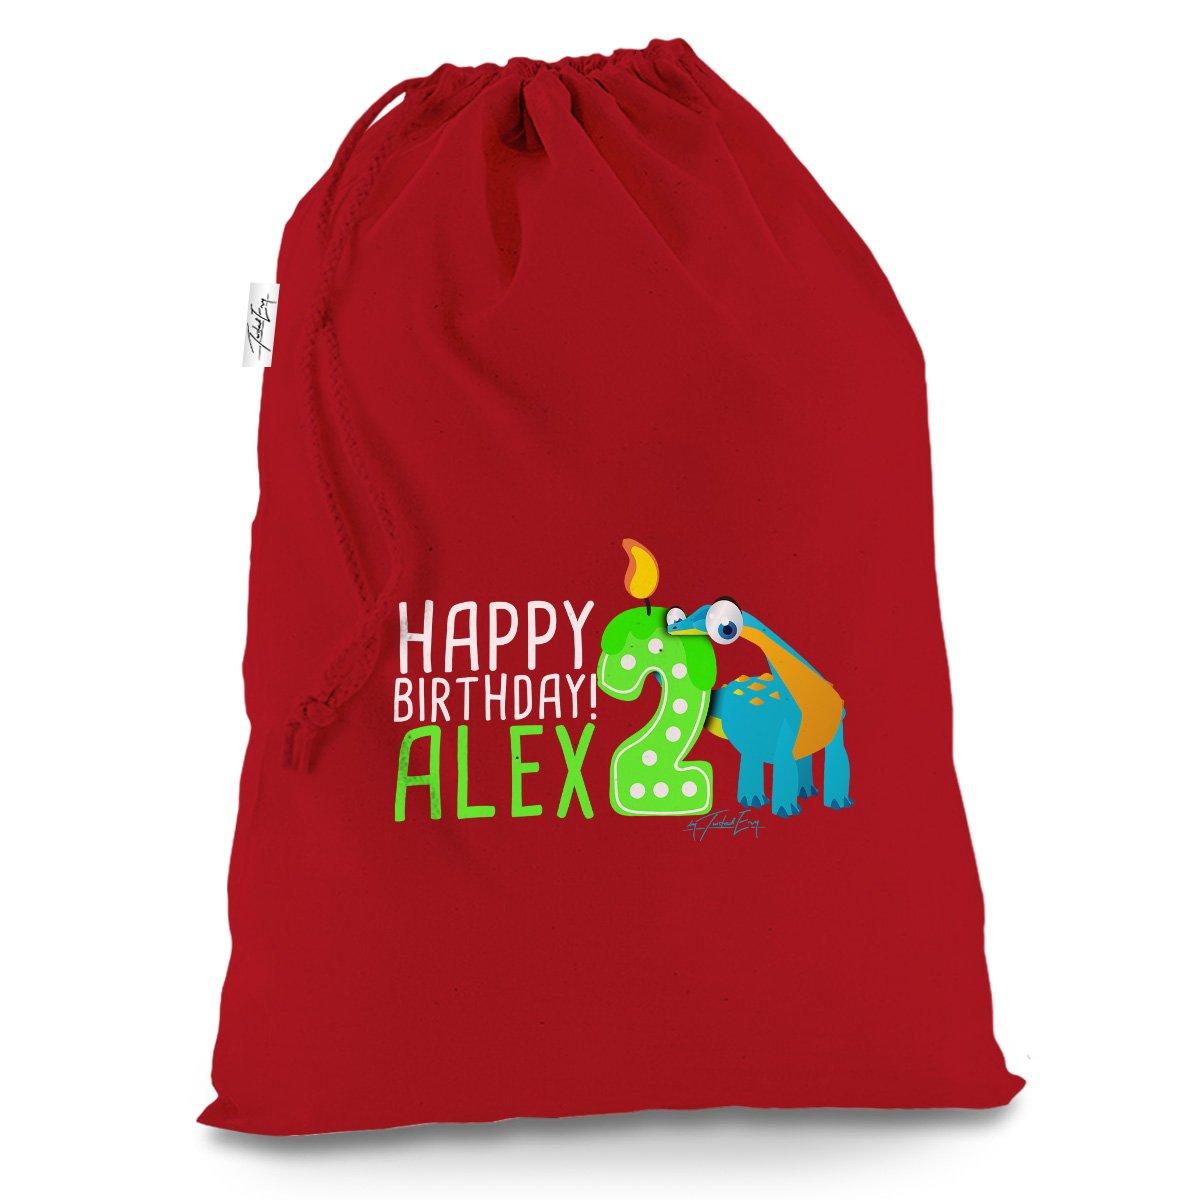 Personalised Baby Dinosaur 2Nd Birthday Large Red Luxury Christmas Santa Sack